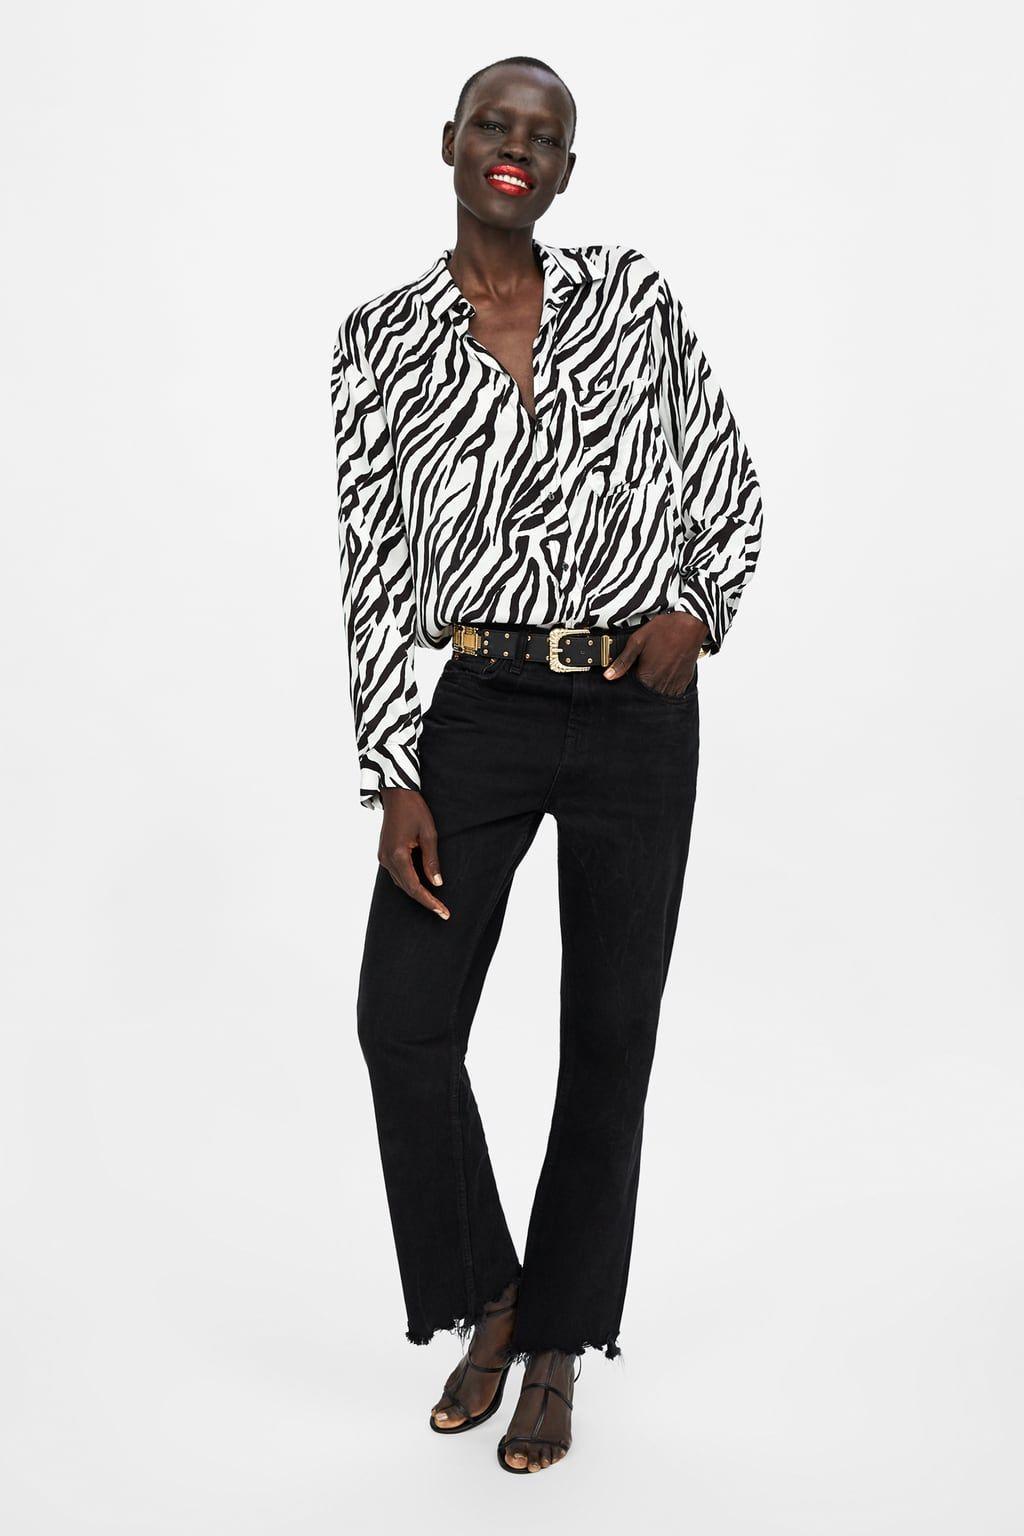 6fecff7c Image 1 of ZW PREMIUM ZEBRA SHIRT from Zara Womens Clothing Stores, Clothes  For Women